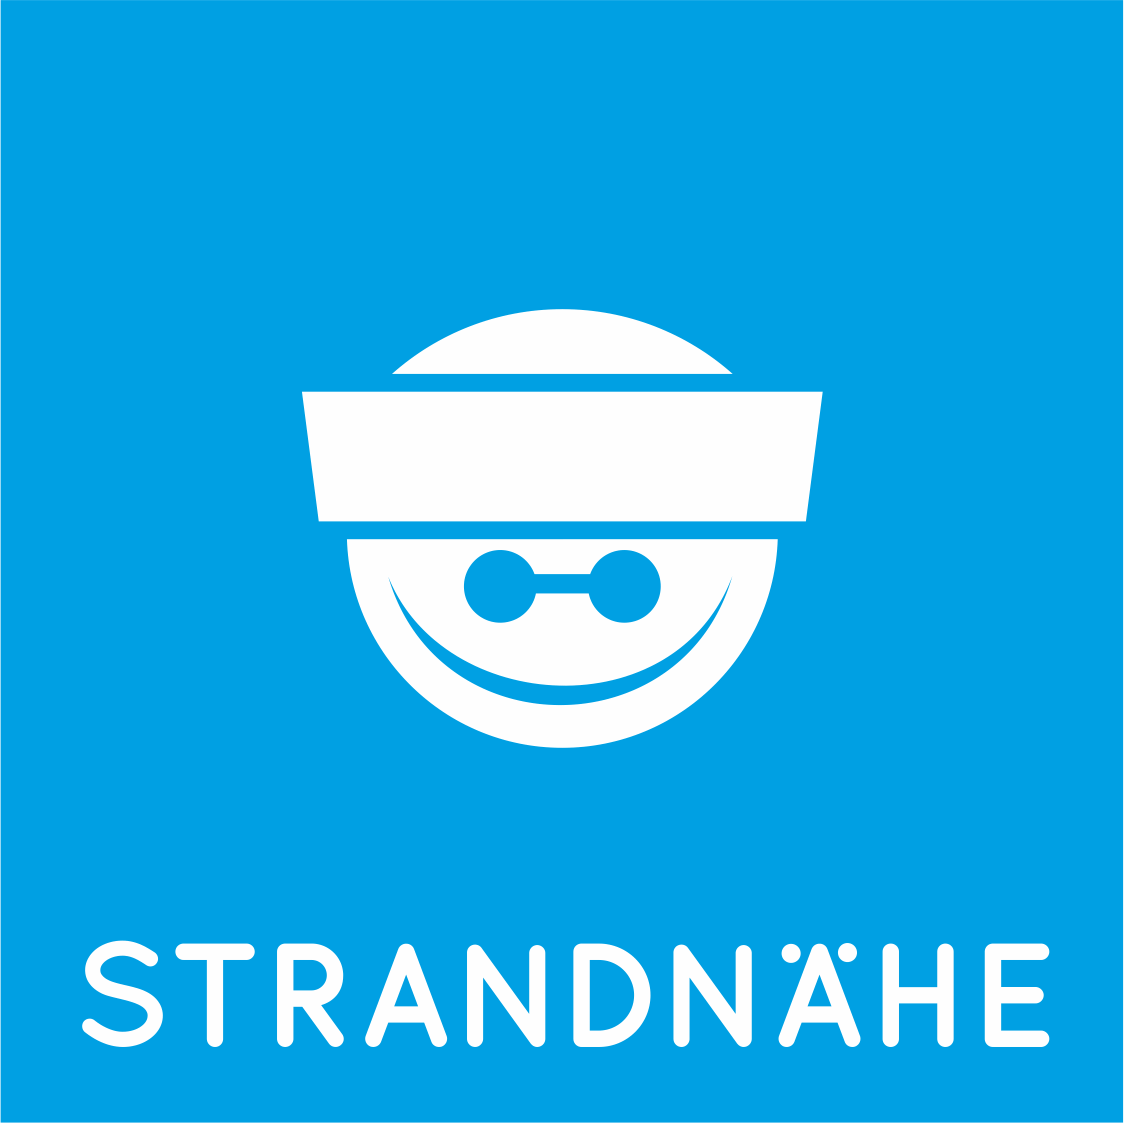 strandnaehe-logo-design-manufaktur-matrose